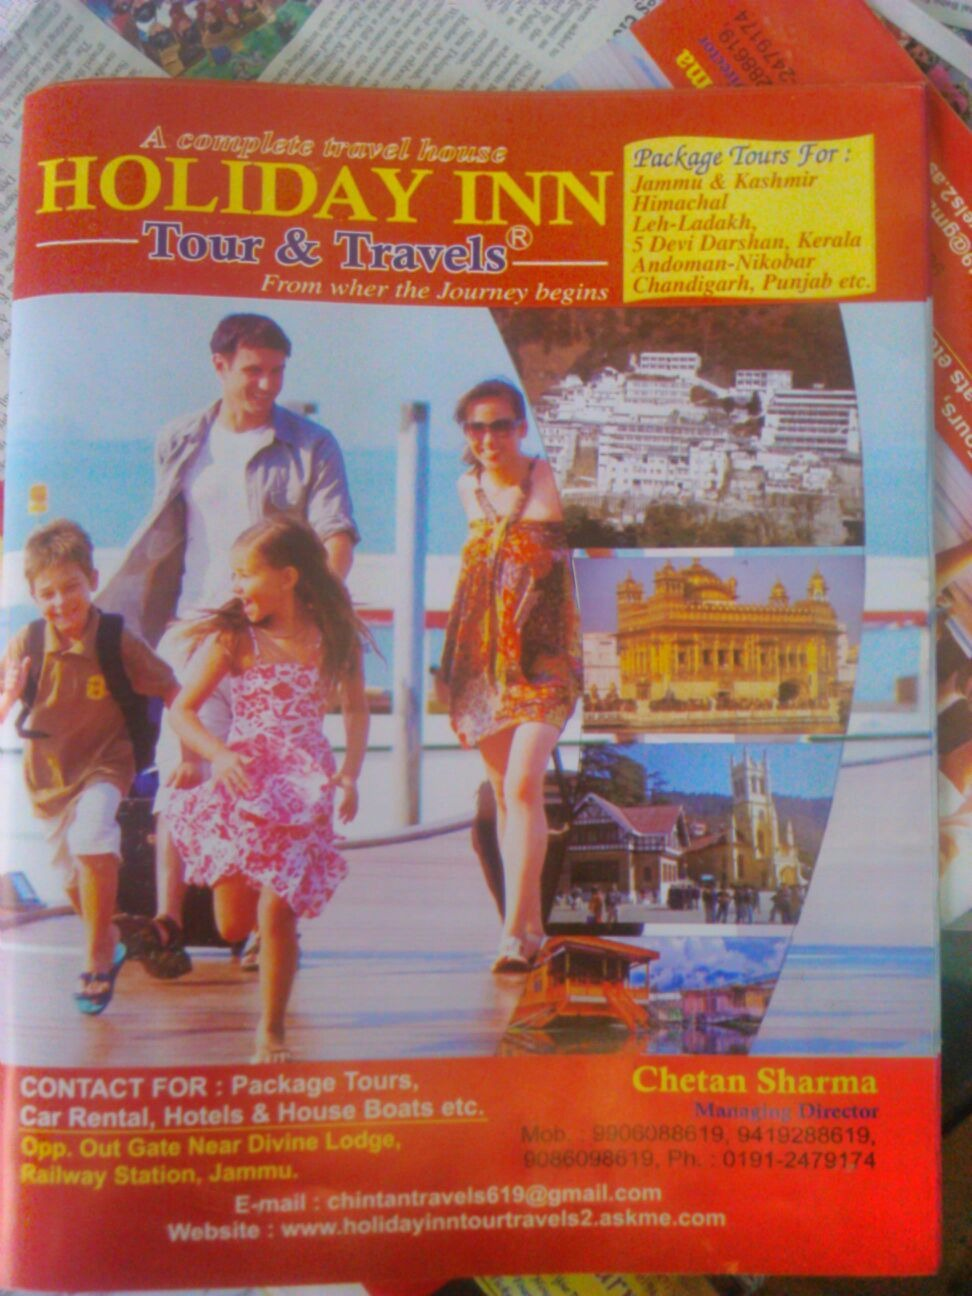 Holiday Inn Tour & Travels - logo